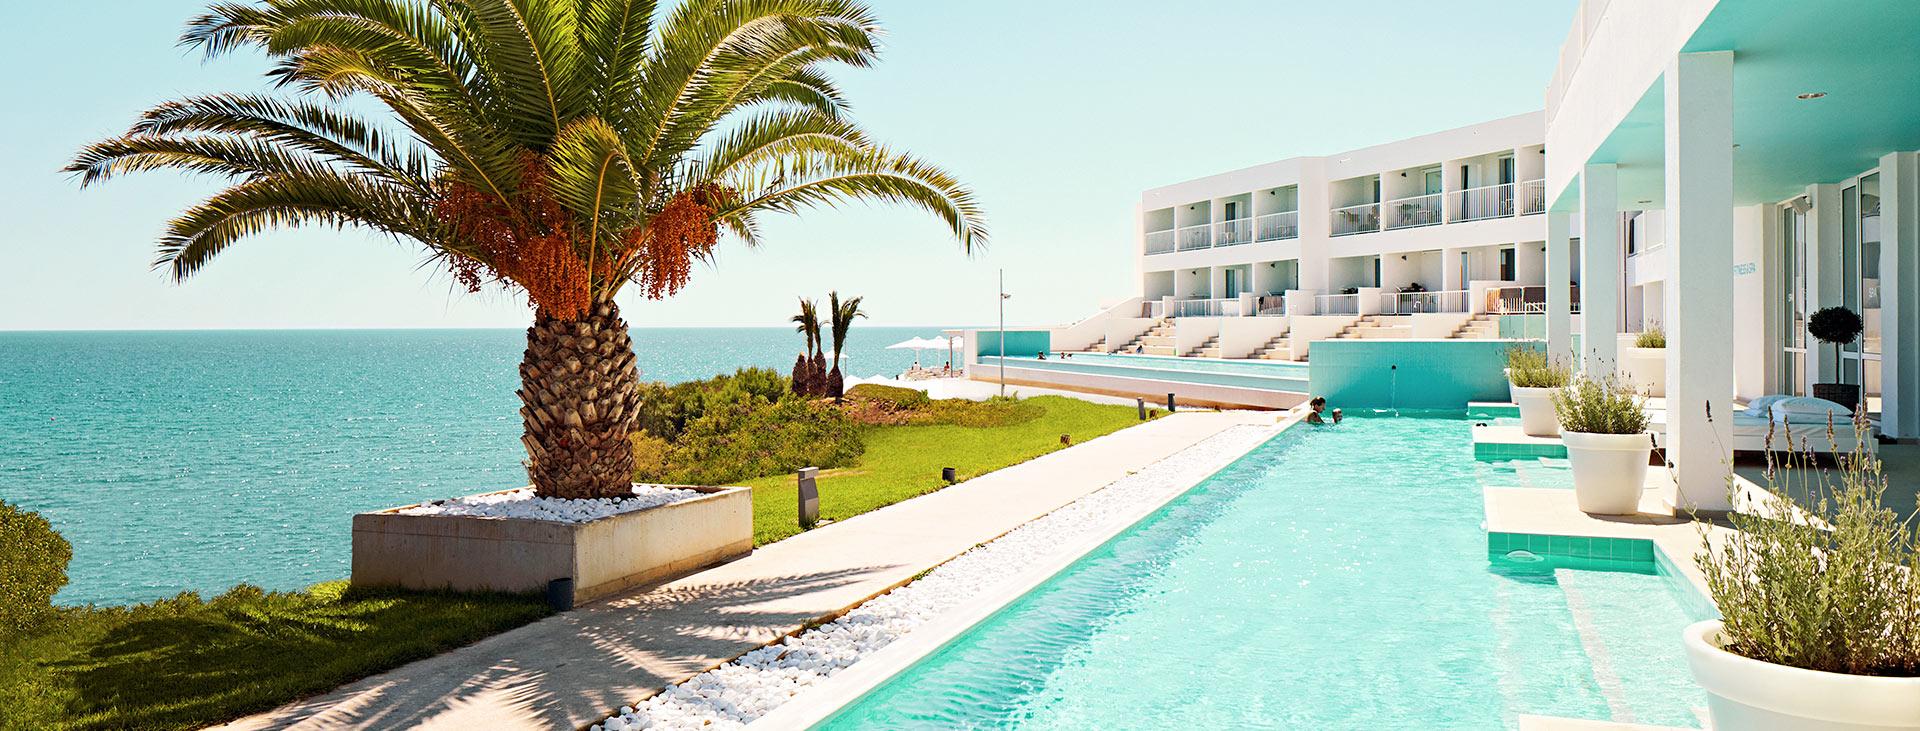 Ocean Beach Club - Kreta, Makrigialos, Kreta, Grekland